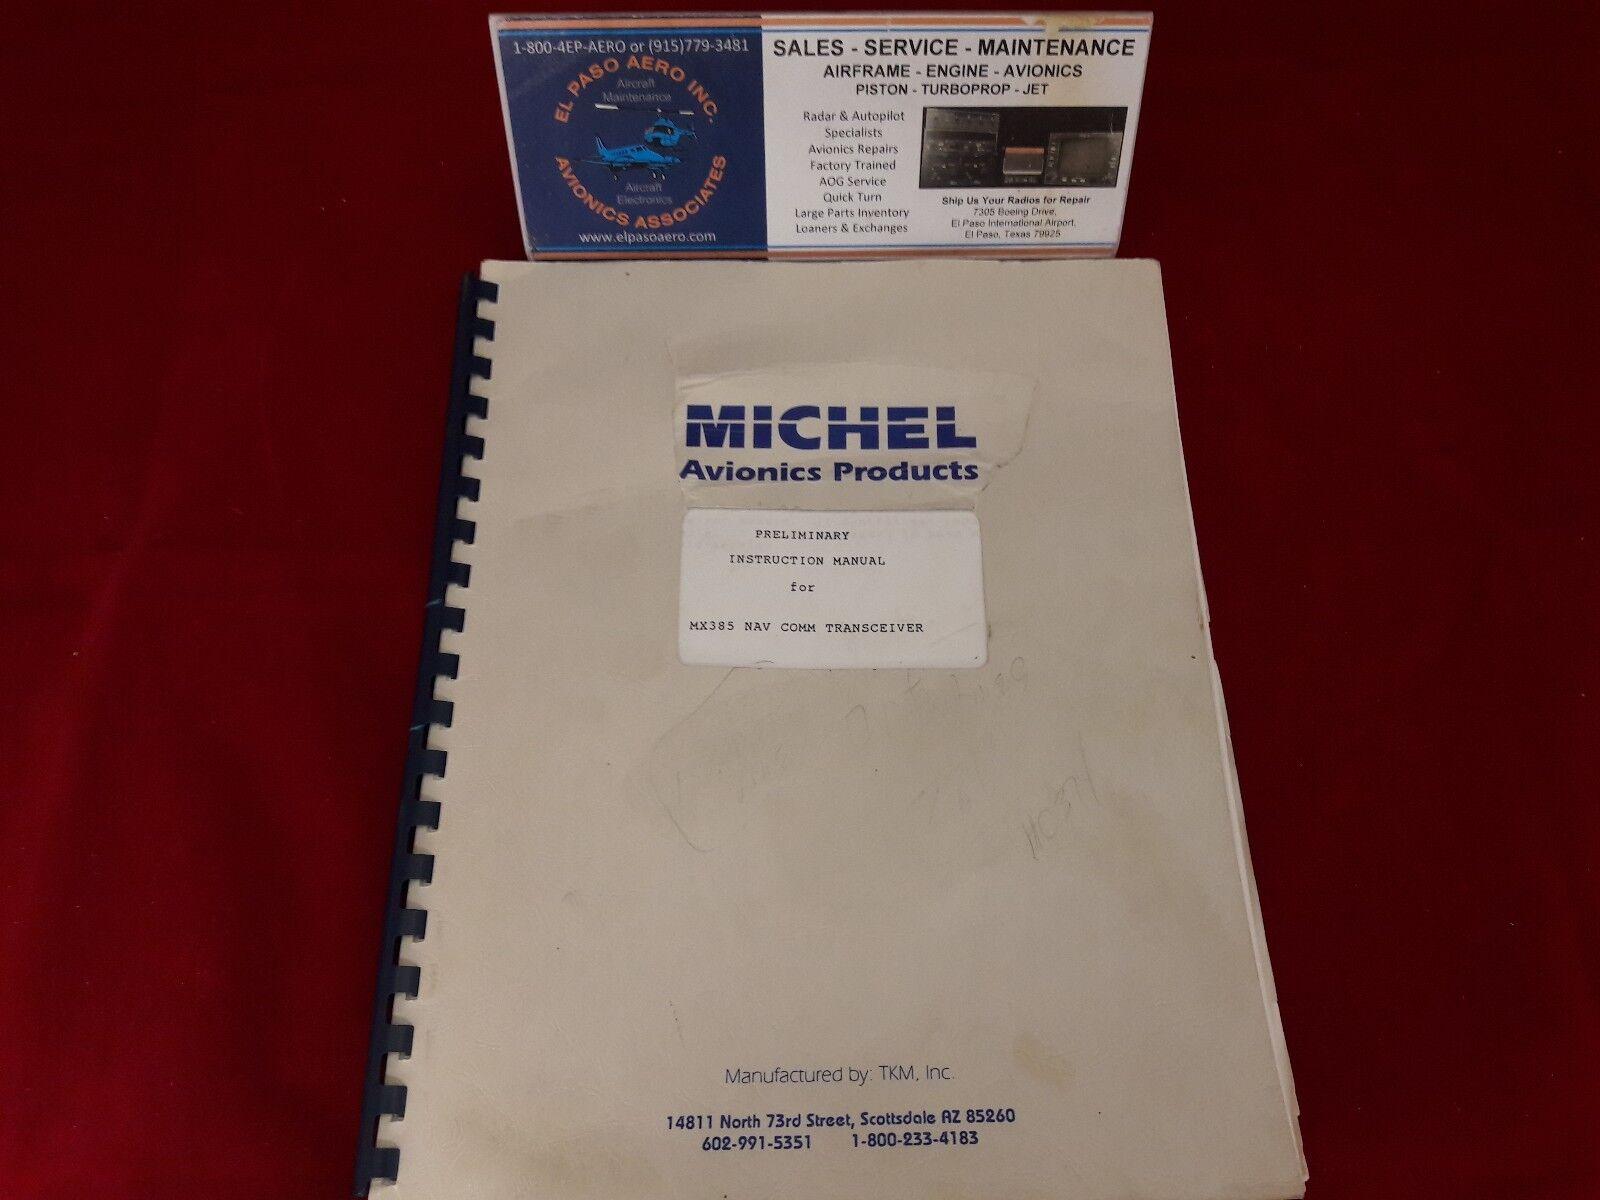 Michel MX385 Preliminary Instruction Manual. $100